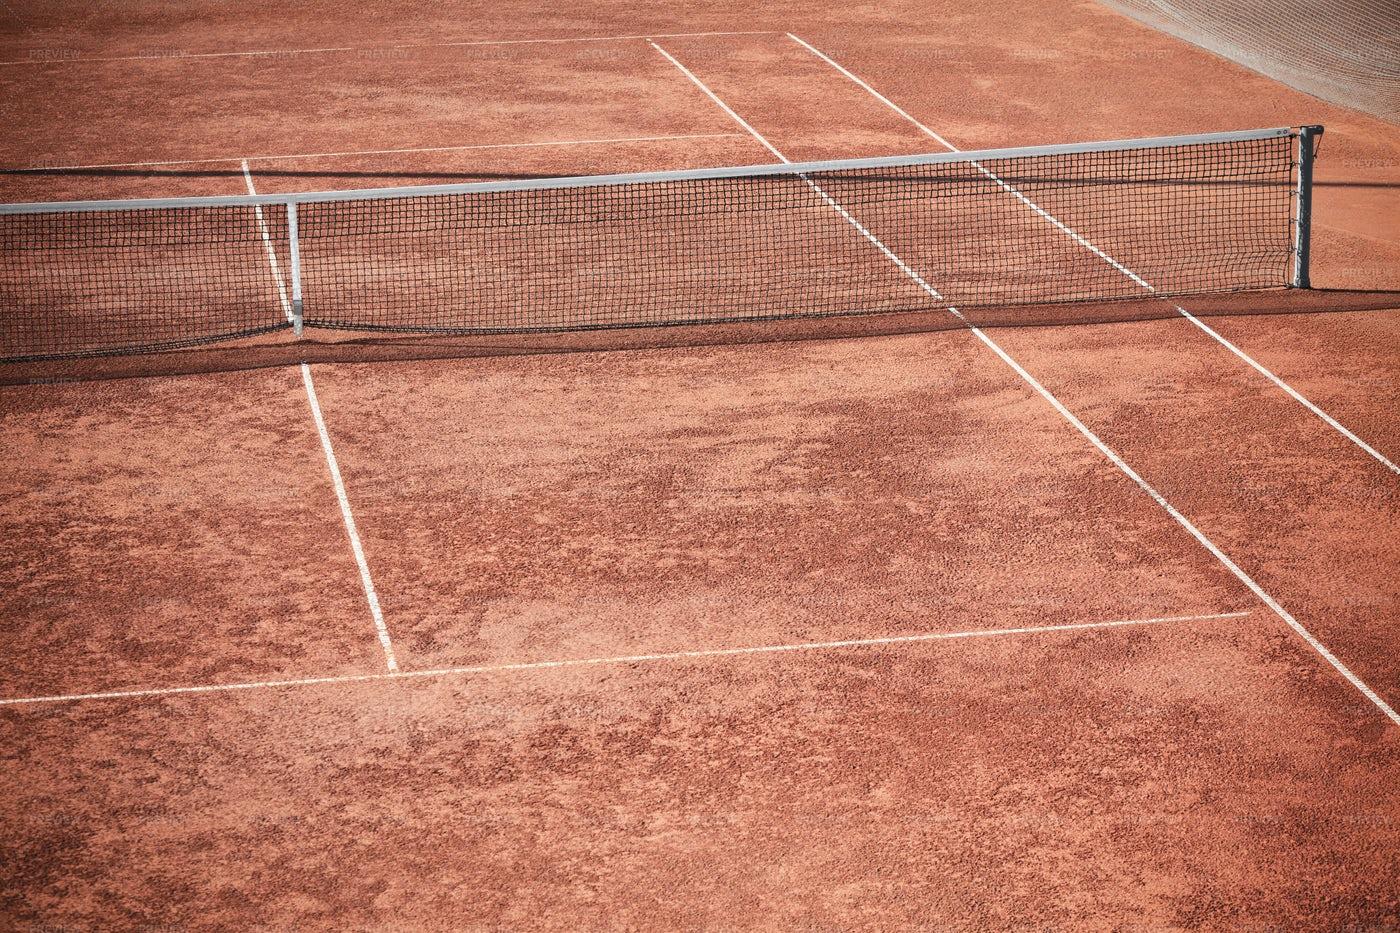 Empty Tennis Court With Net: Stock Photos